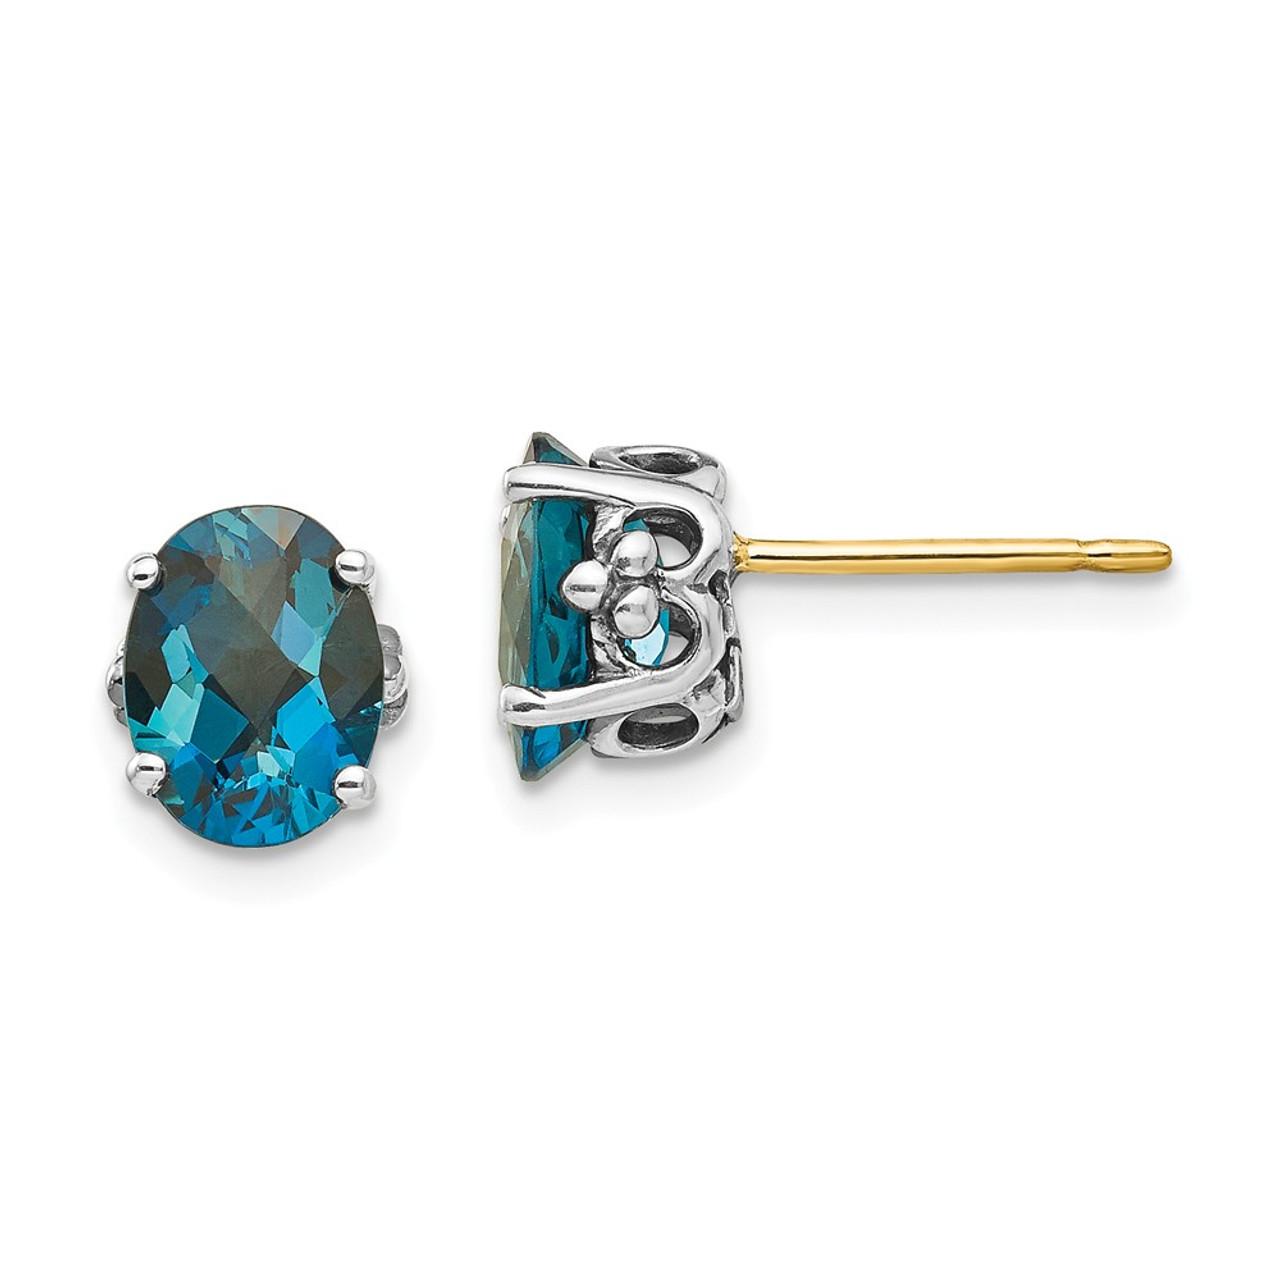 2 Ct London Blue Topaz /& Diamond Oval Stud Earrings 14Kt Yellow Gold Plated